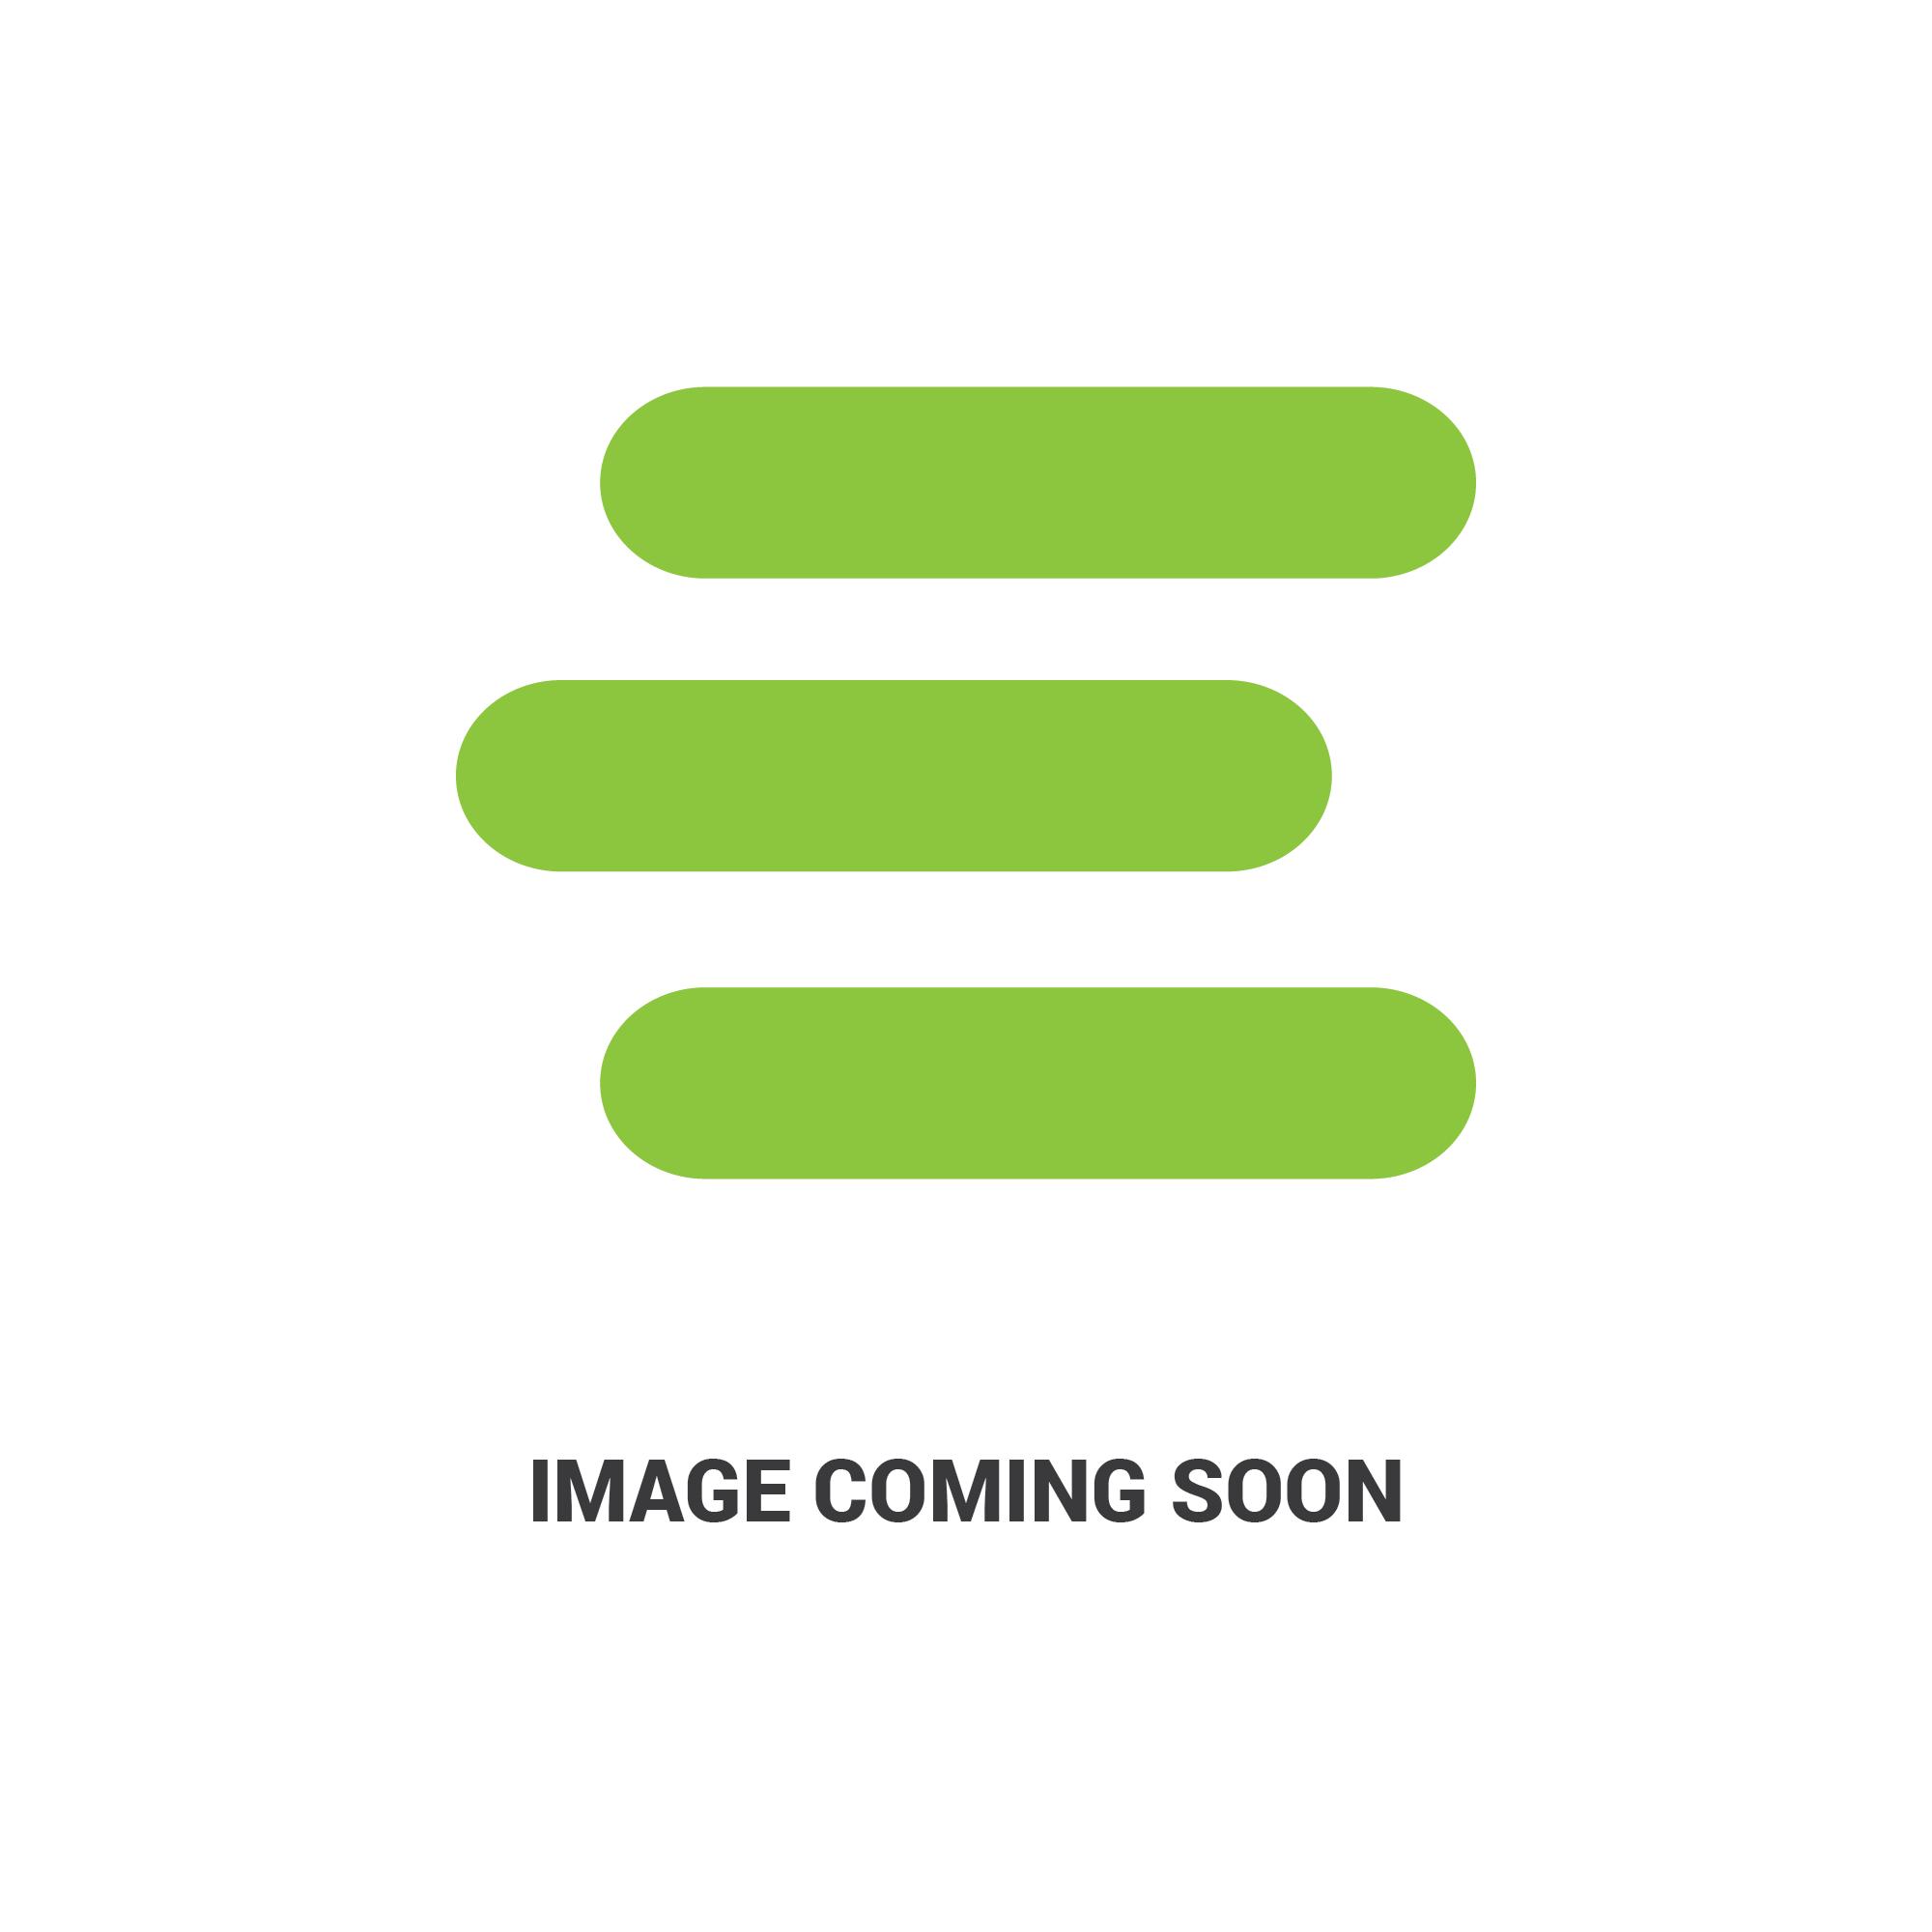 E-66103-459331981_1.jpg